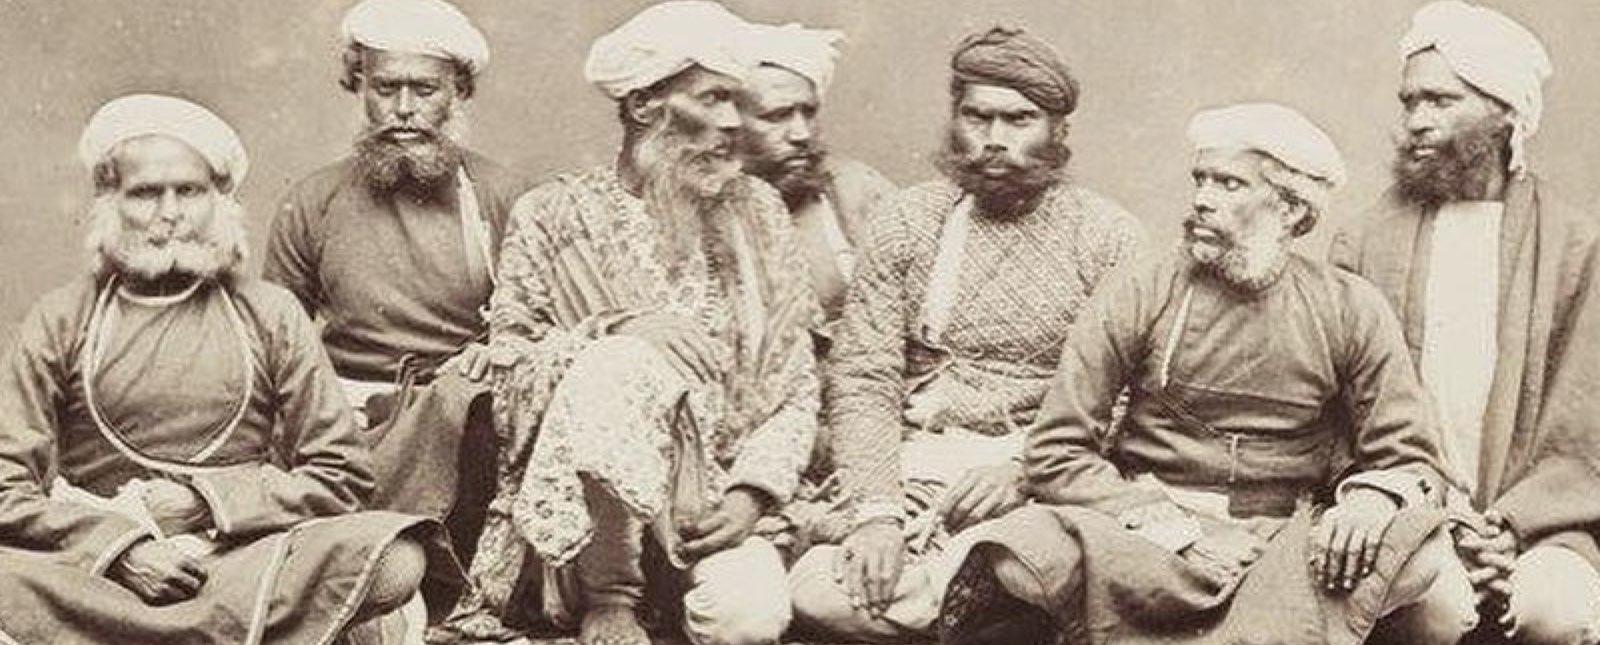 thug-history-etymology-thuggee-secret-cult-in-india